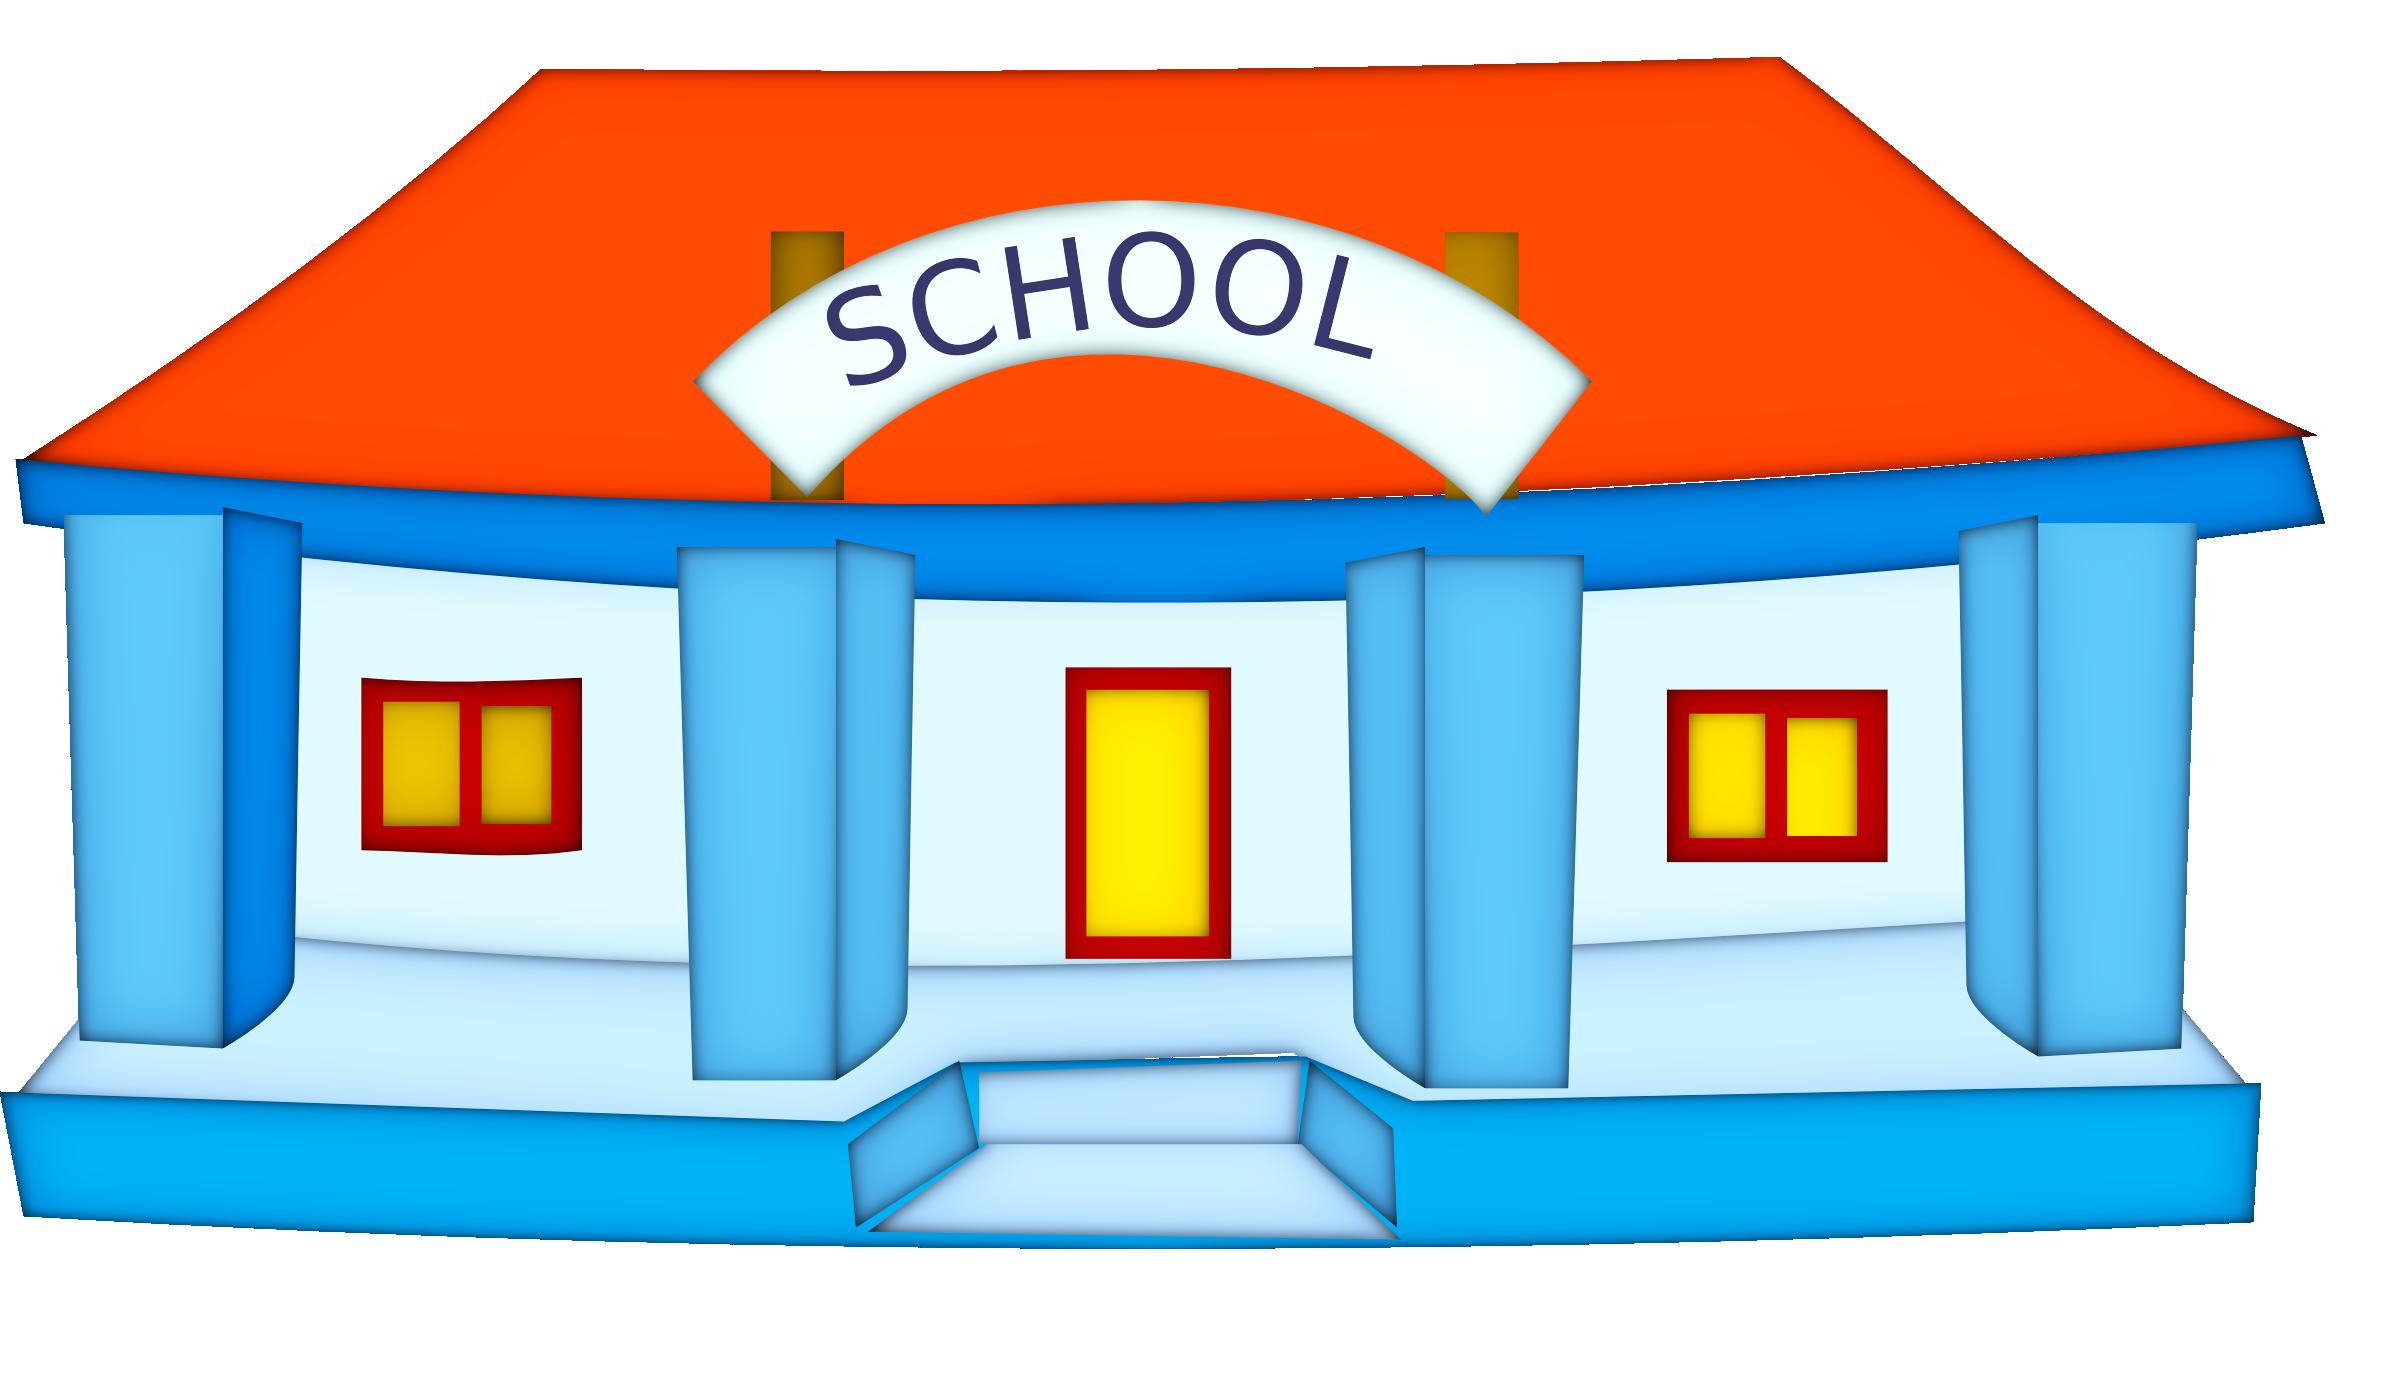 Public School Clipart #1 .